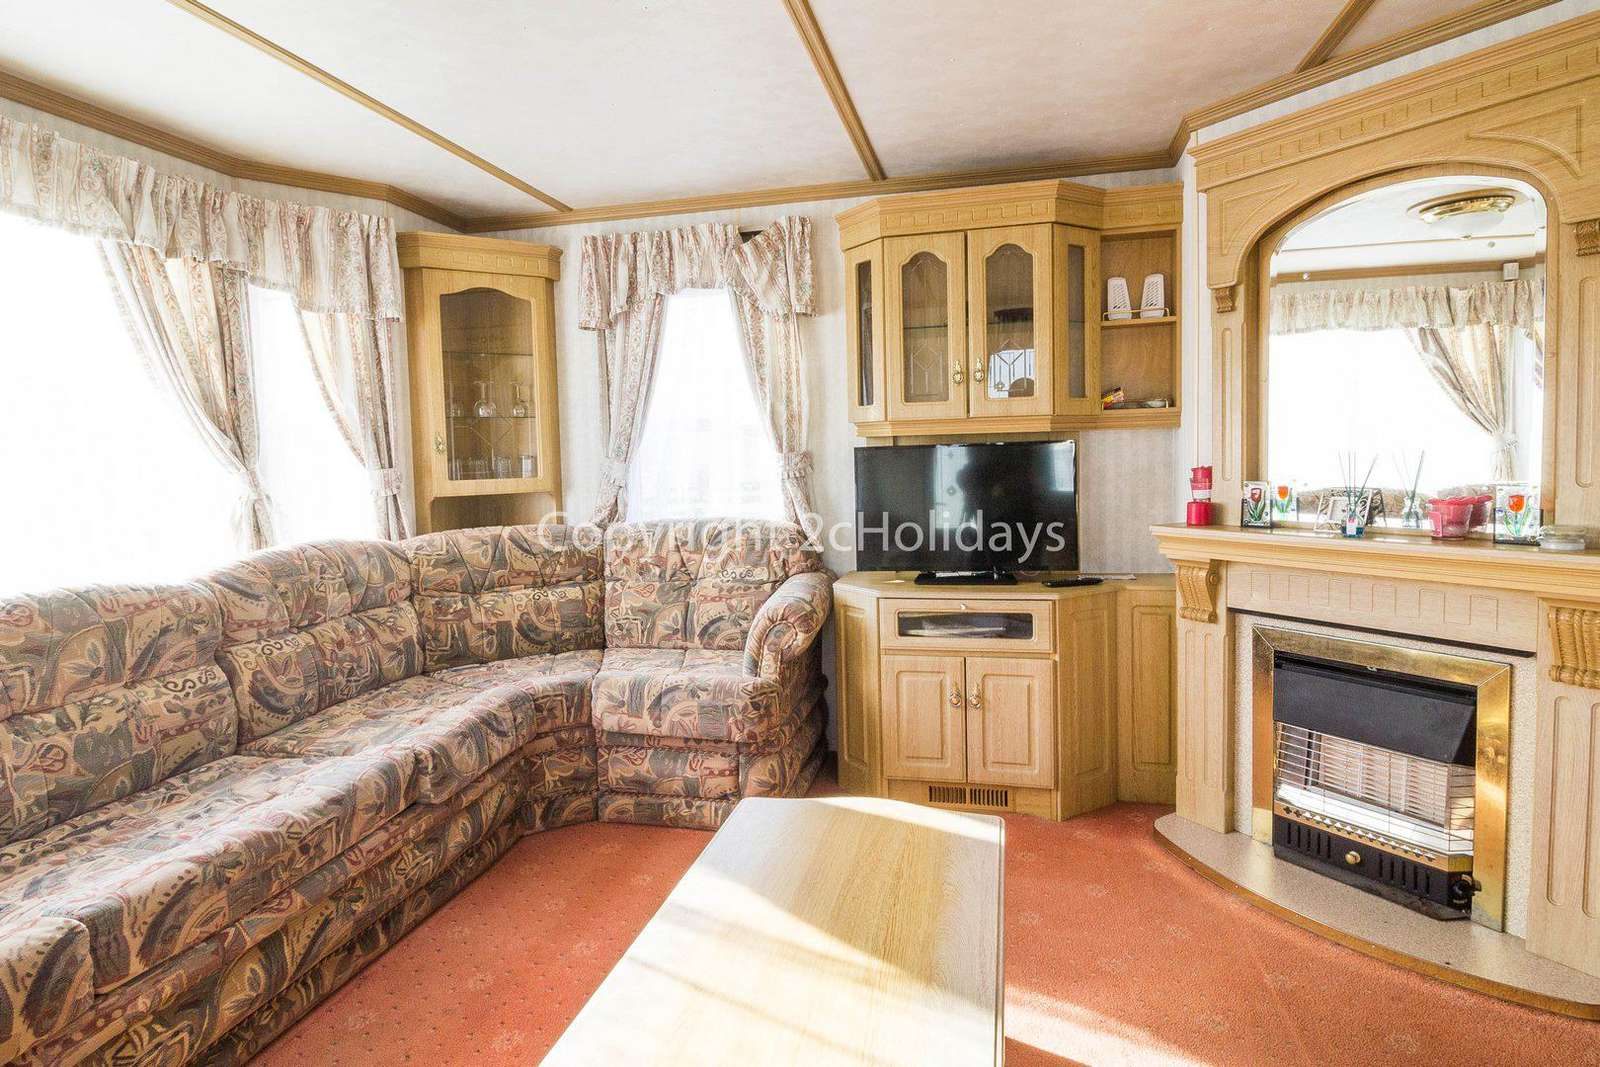 Caravan for hire in Scratby